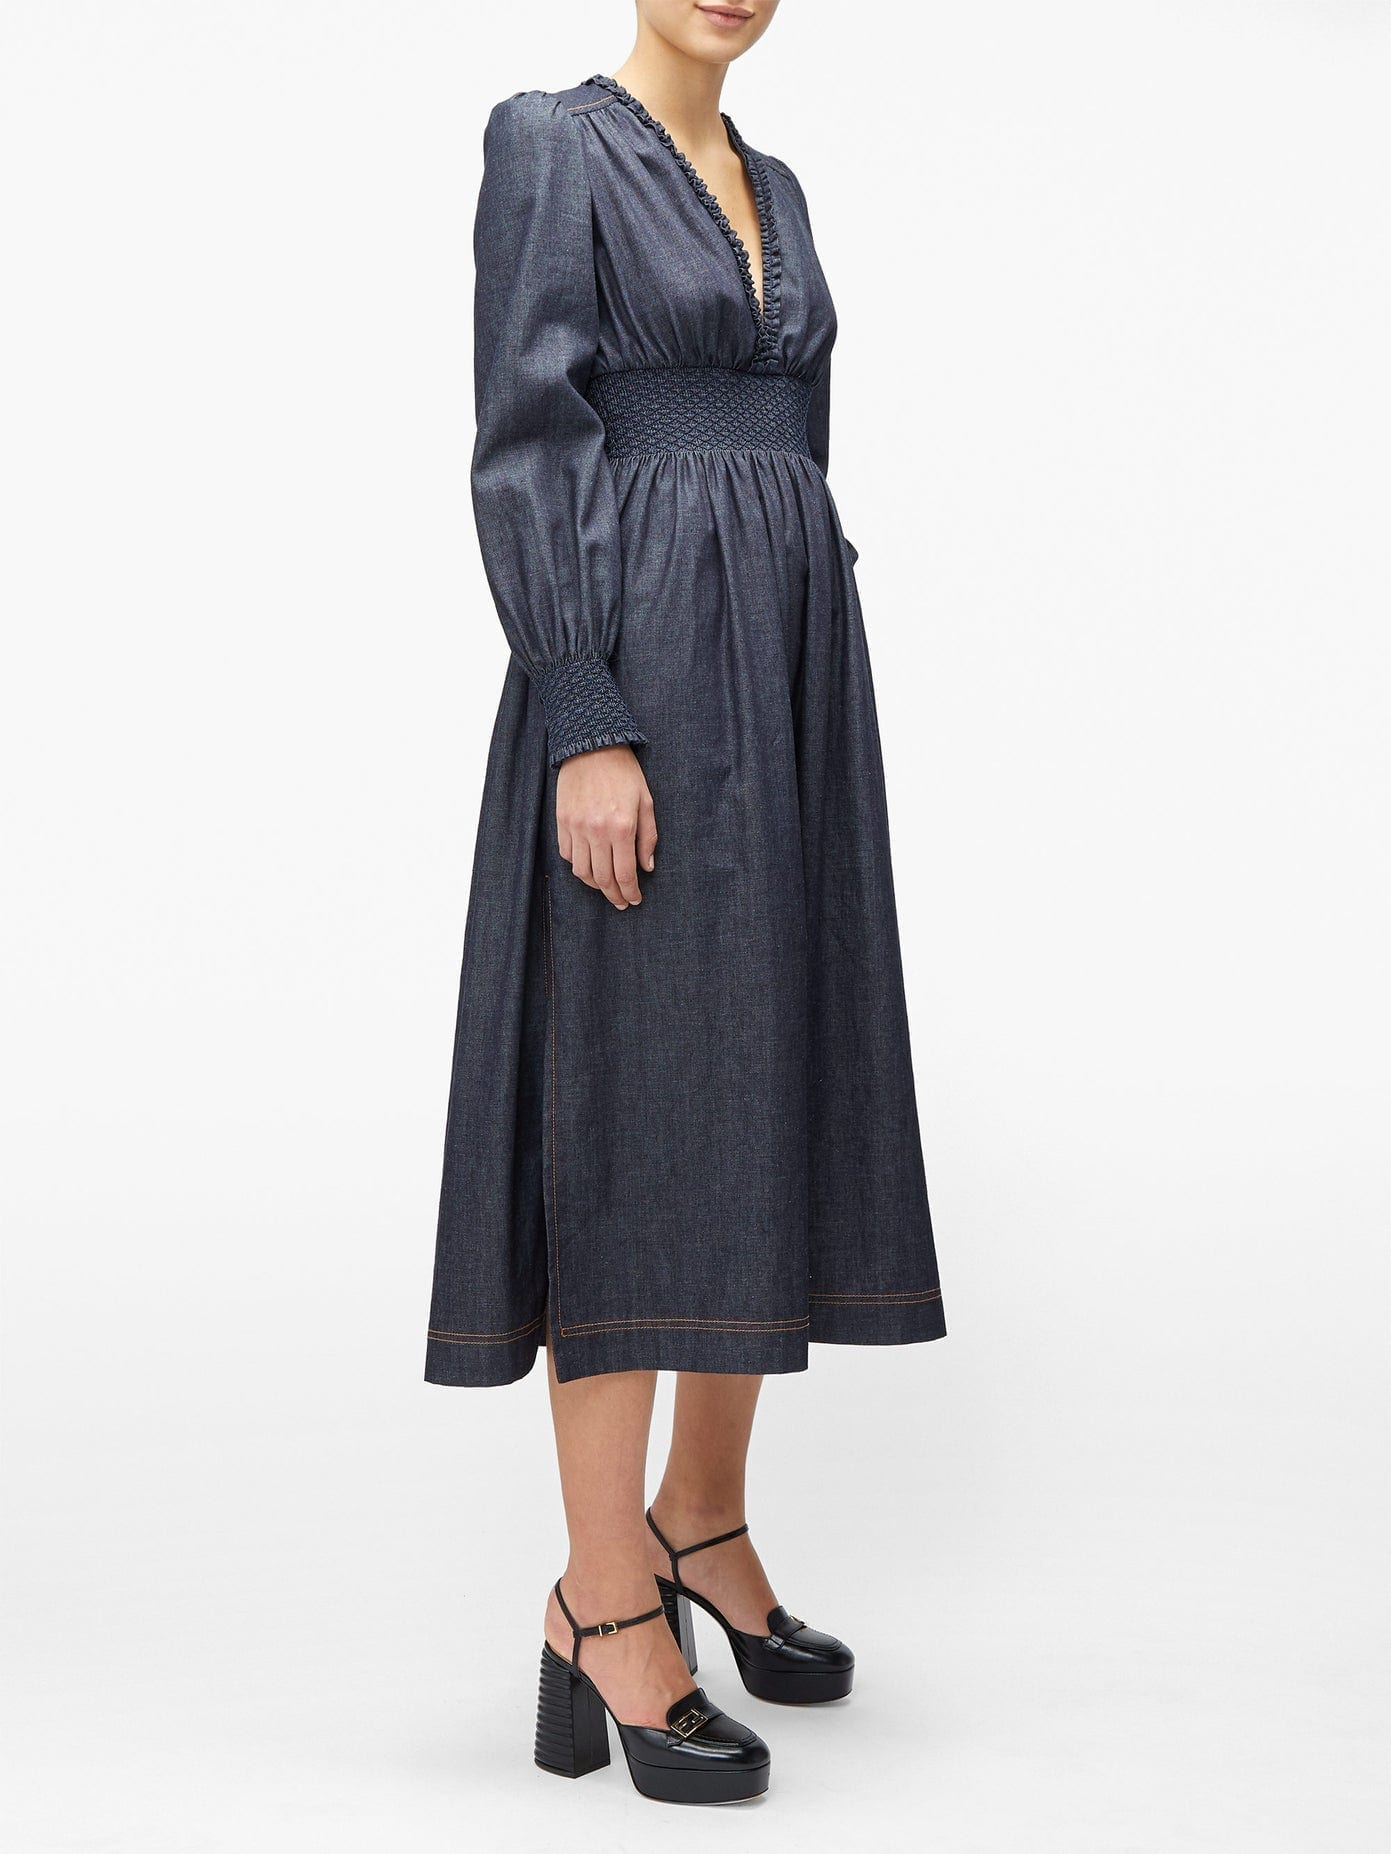 FENDI Smocked Chambray Midi Dress